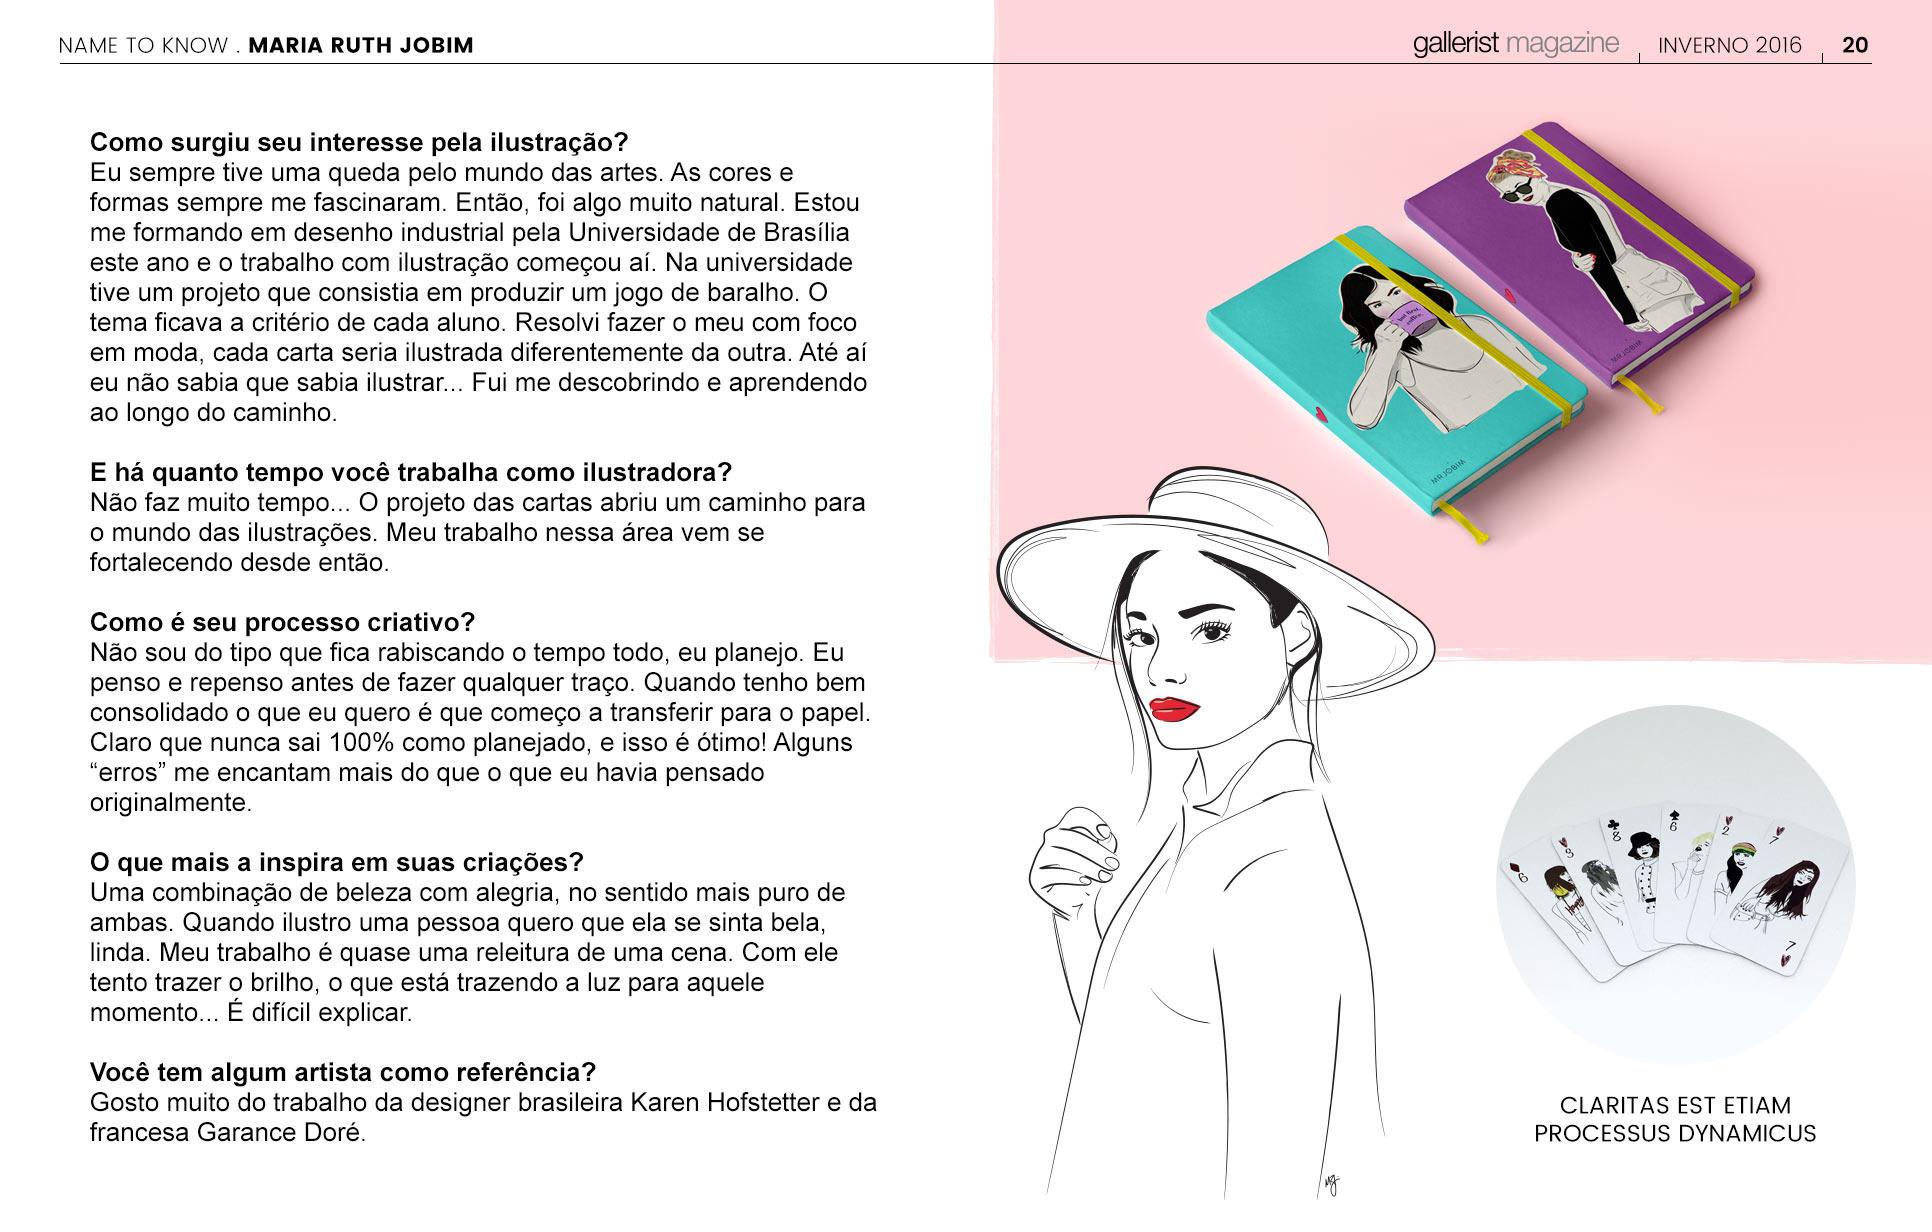 d70cd78b7 Gallerist Magazine - Gallerist Blog & Shop